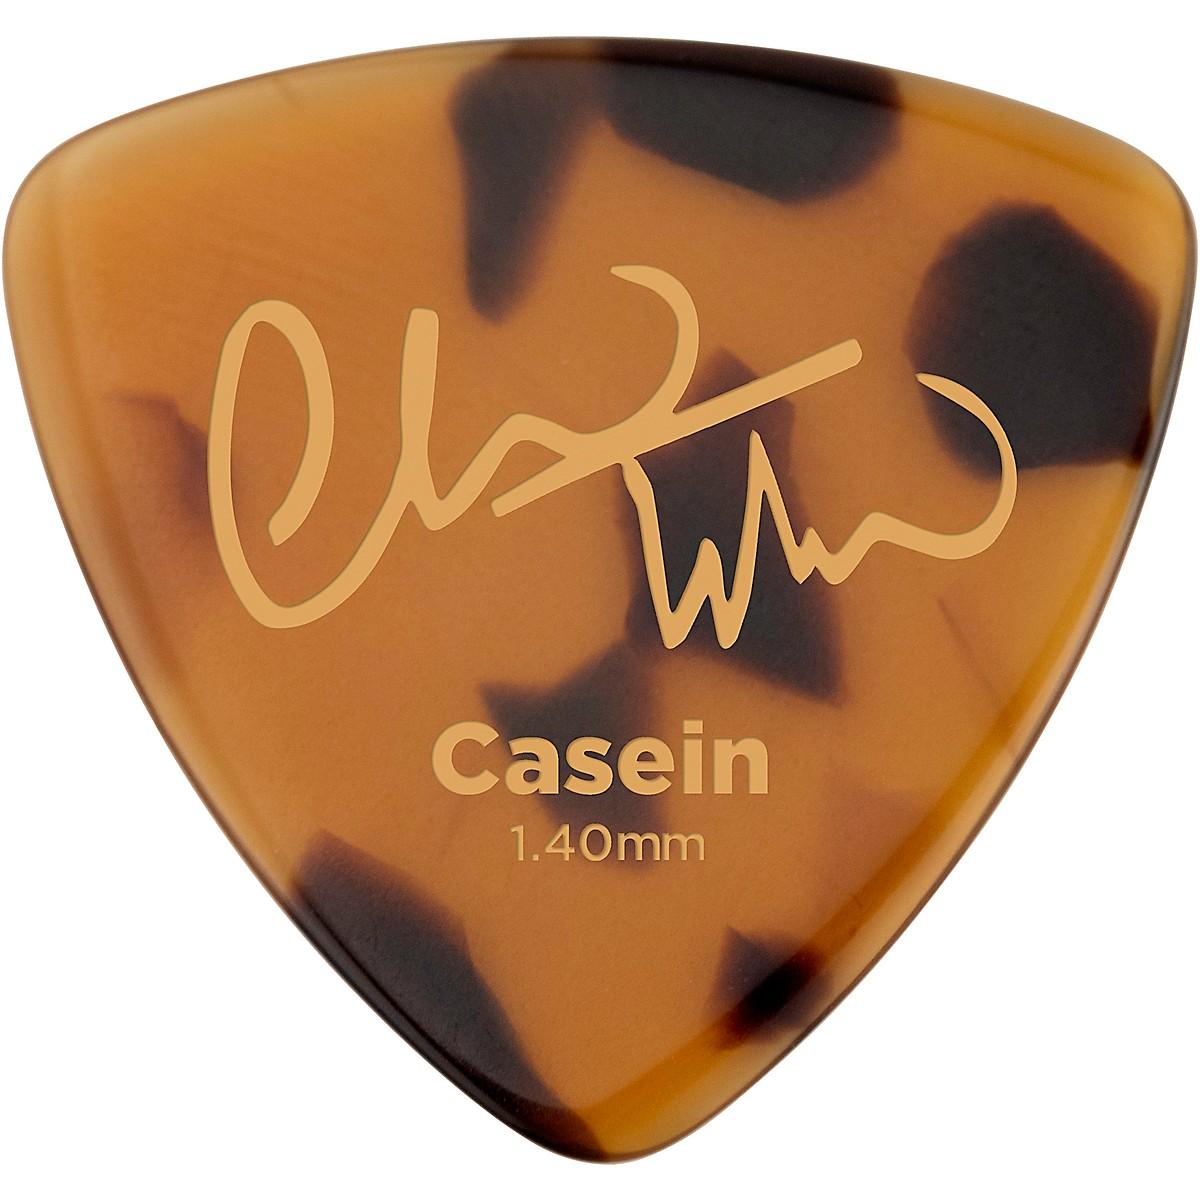 D'Addario Planet Waves Chris Thile Signature Casein 1.4mm Mandolin Pick